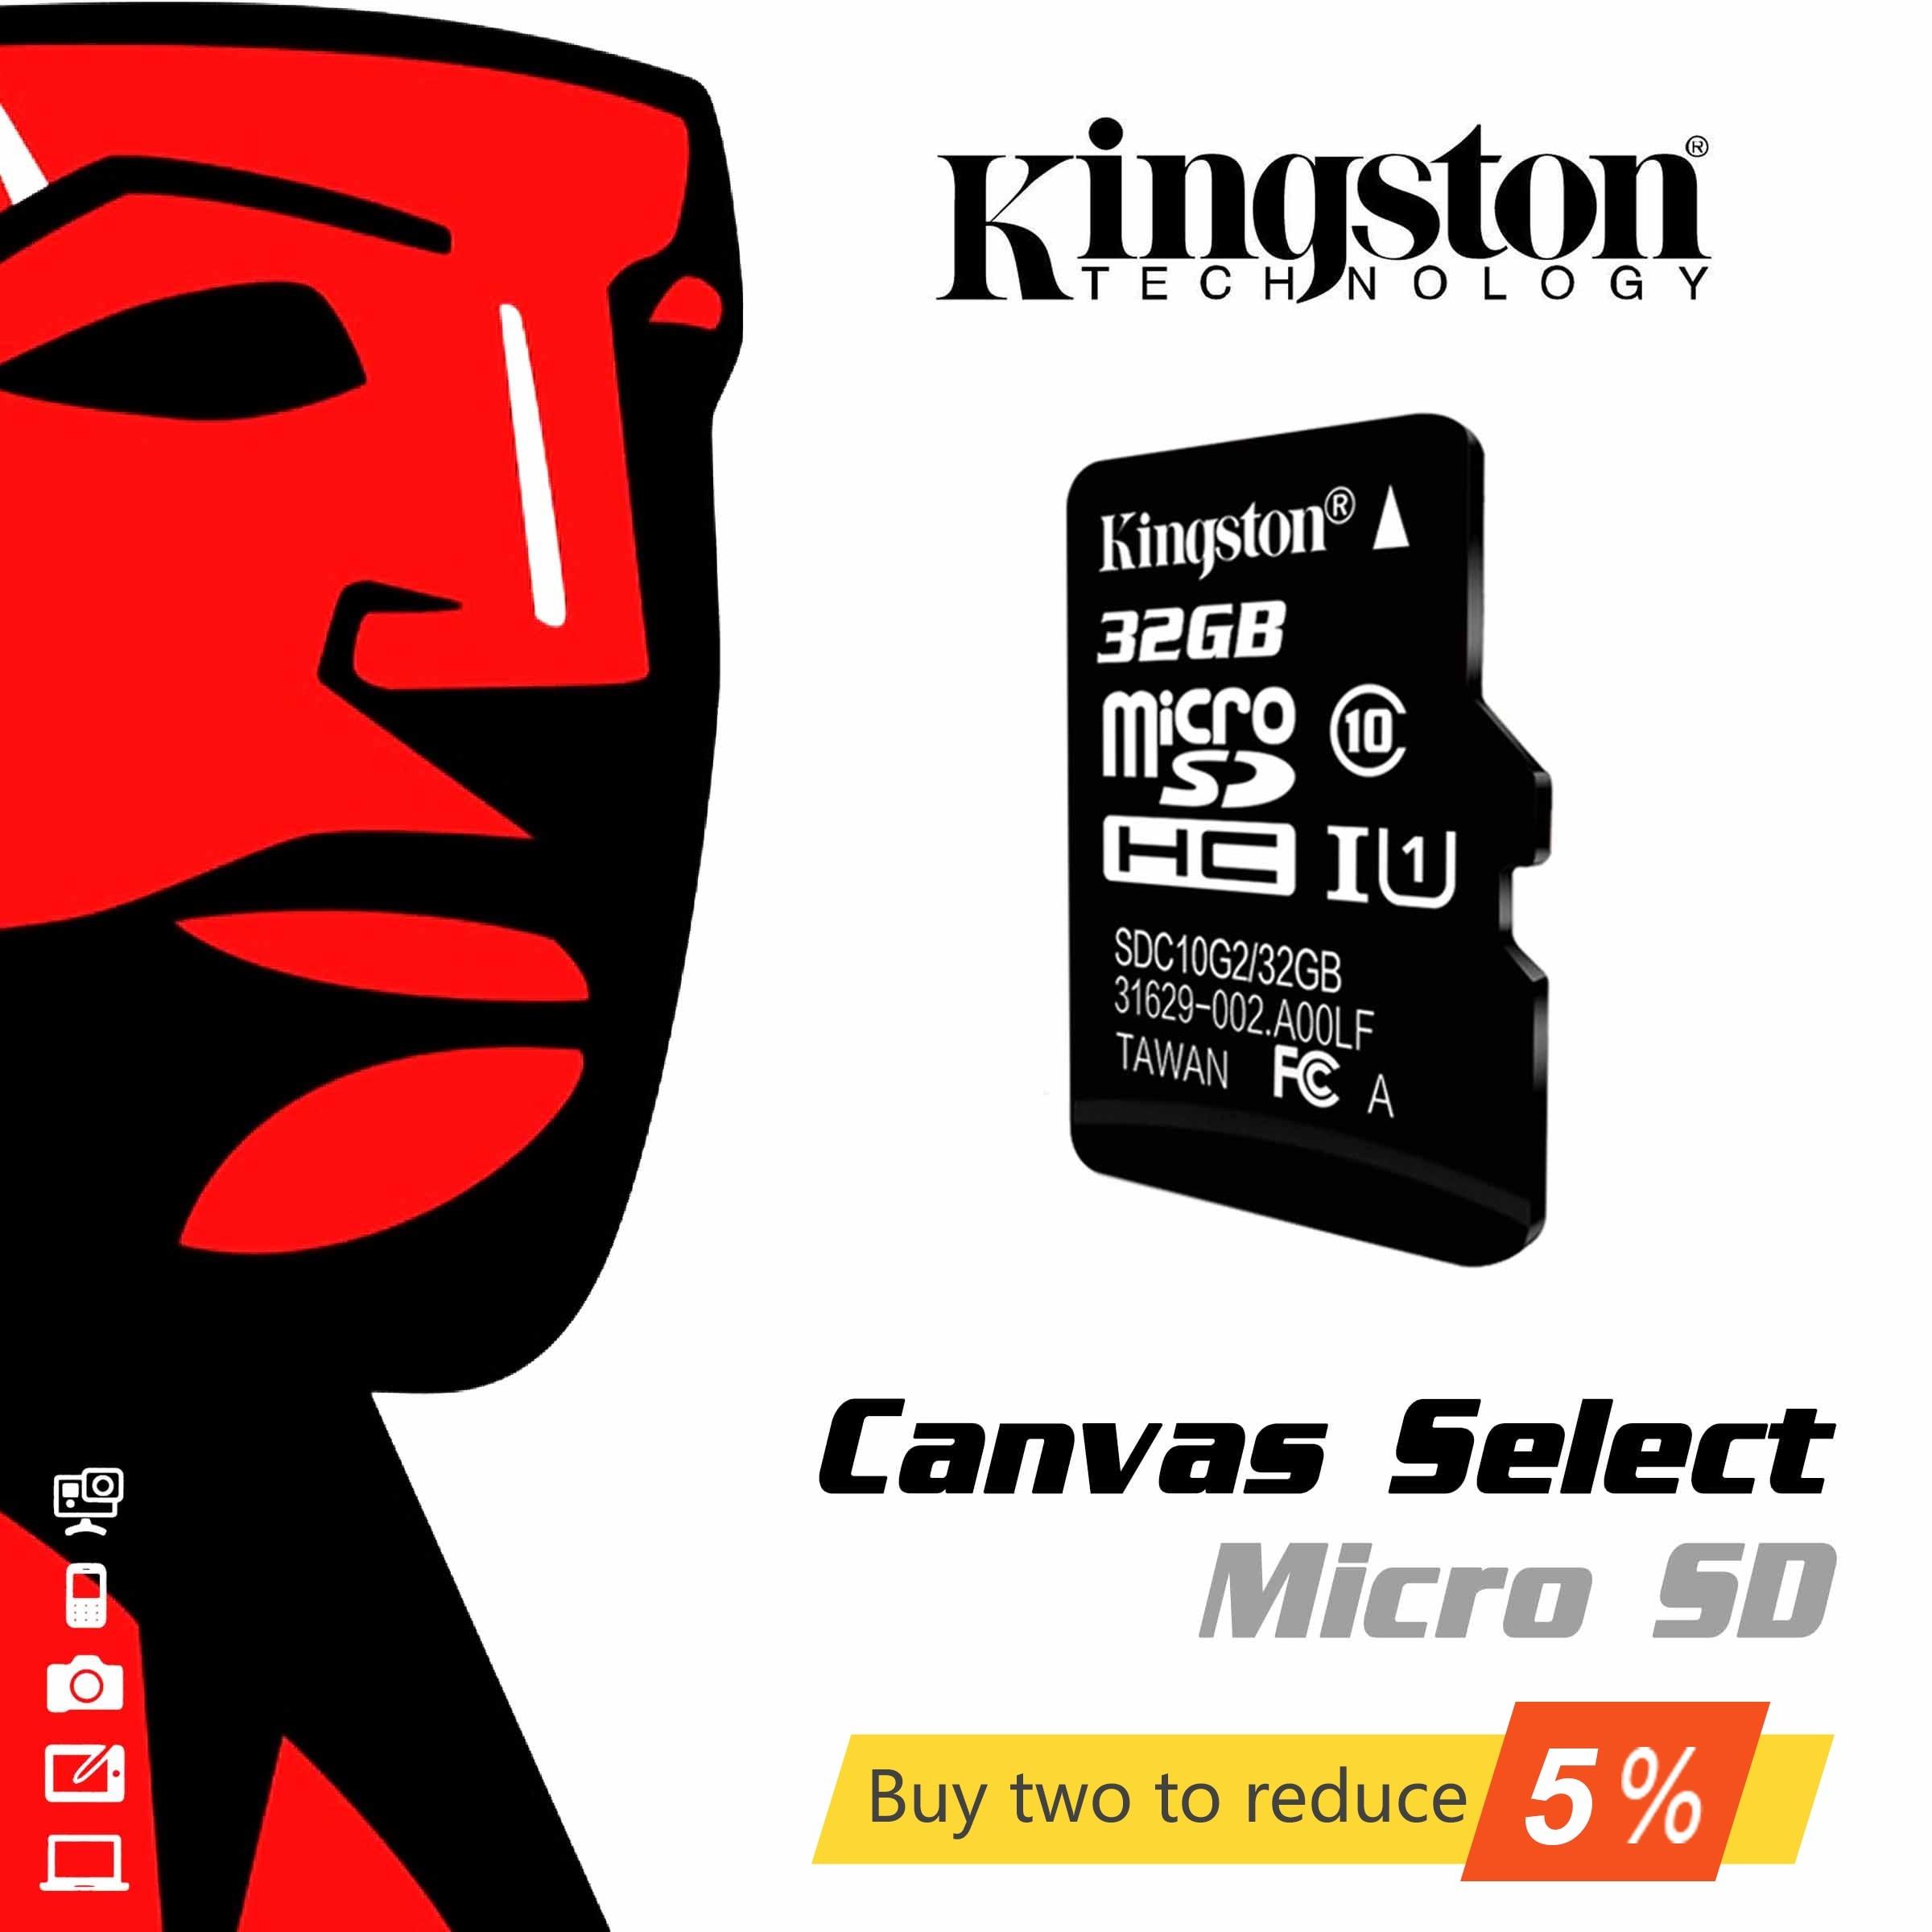 Original de Kingston tarjeta Micro SD de Clase 10 de 32GB tarjeta de memoria MicroSDHC UHS-I TF Tarjeta 8GB 16GB 32GB 64GB 128 GB. Auriculares inalámbricos Anker Soundcore Liberty Air TWS con Bluetooth 5, Control táctil y Micro con cancelación de ruido